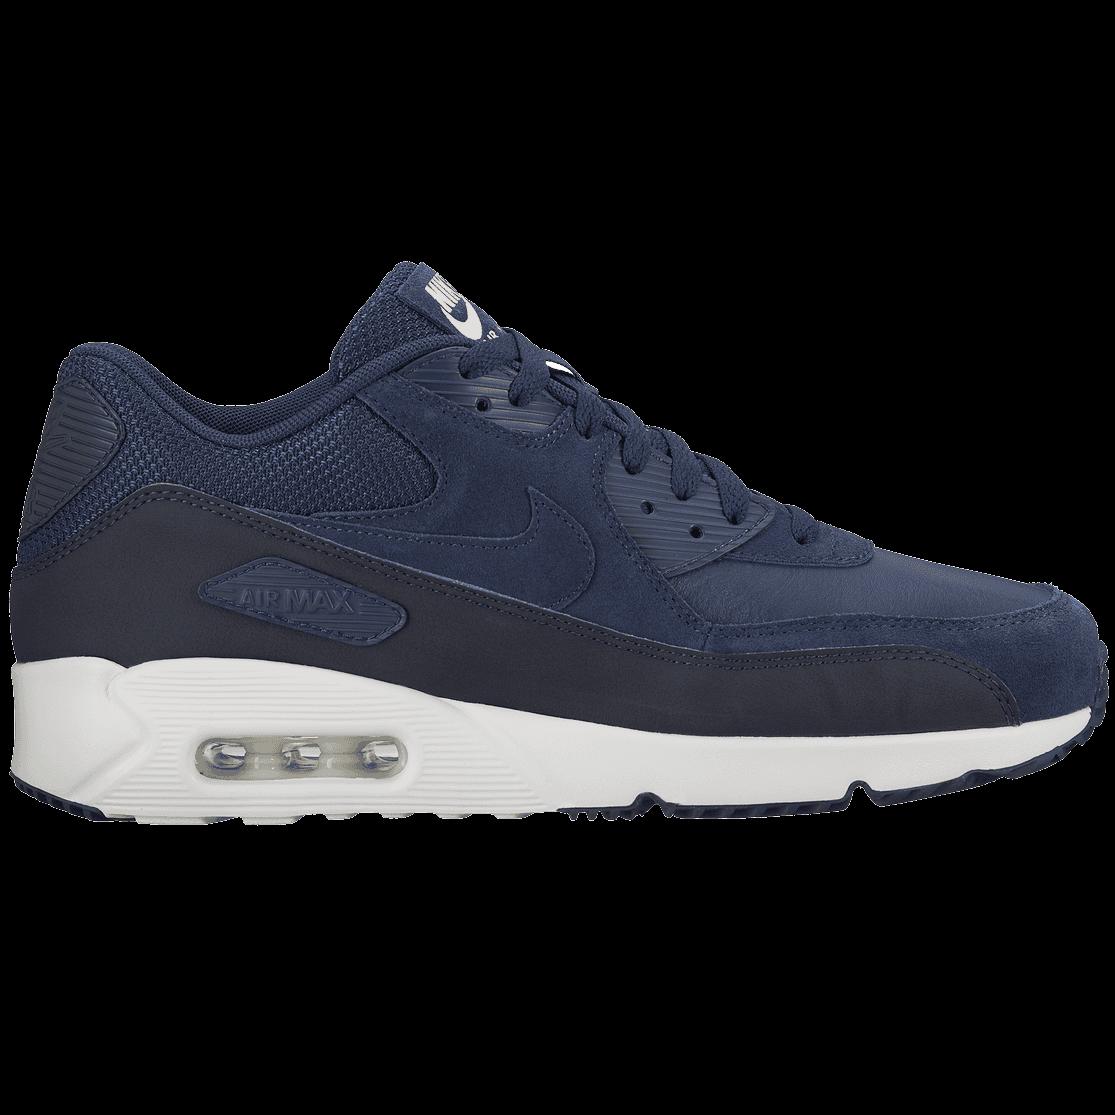 Nike Air Max 90 Ultra 2.0 Leather 924447 400 Blauw